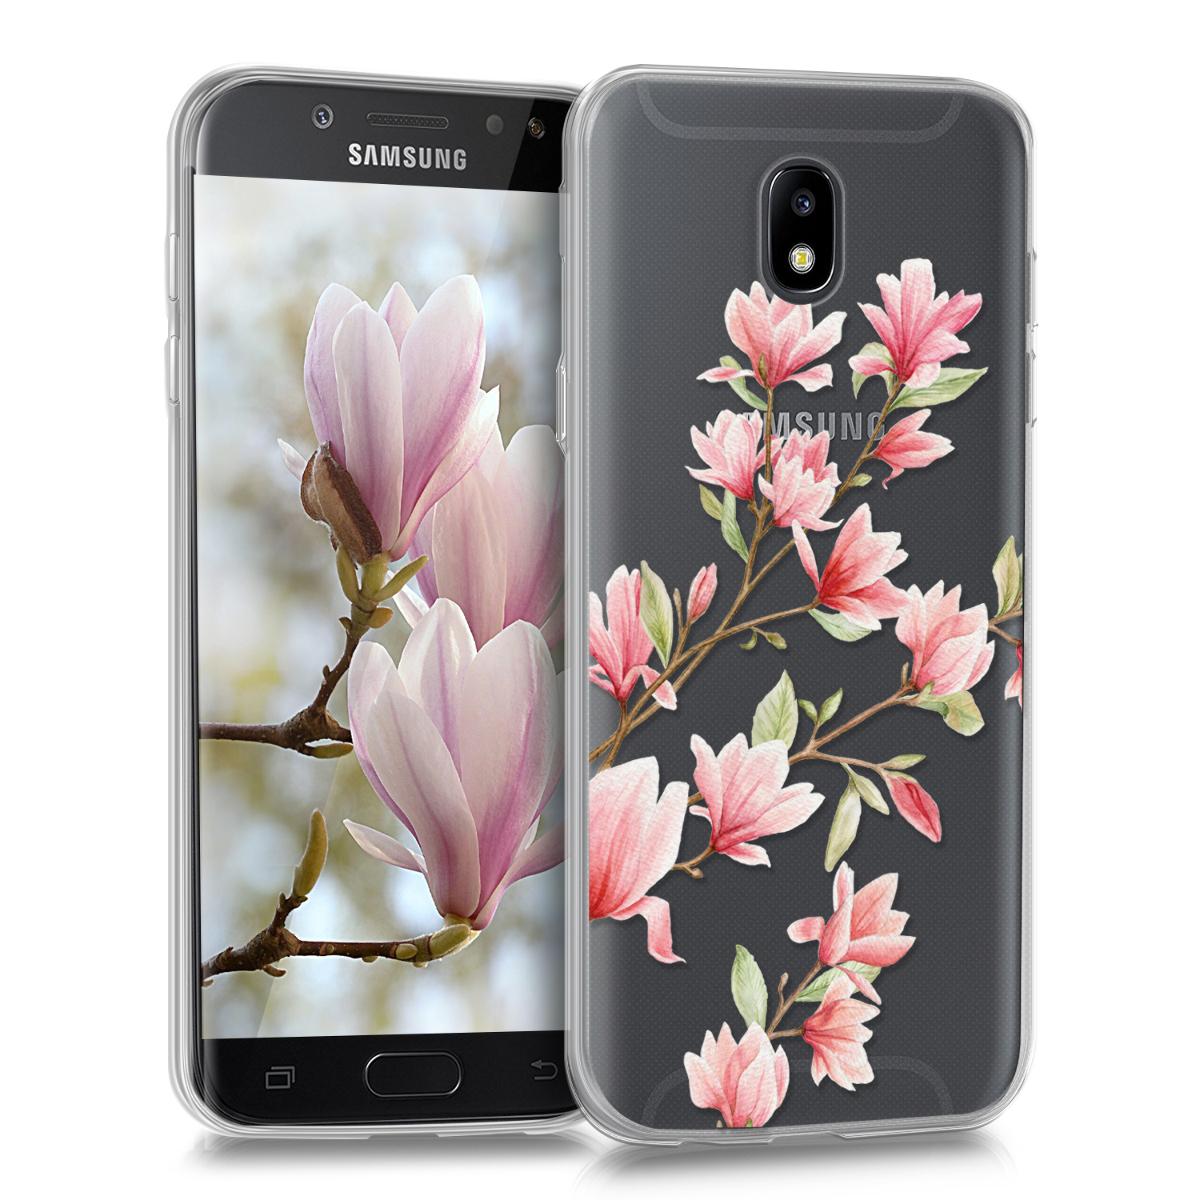 KW Θήκη Σιλικόνης Samsung Galaxy J5 (2017) - Διάφανη με σχέδιο λουλουδιών (42906.07)